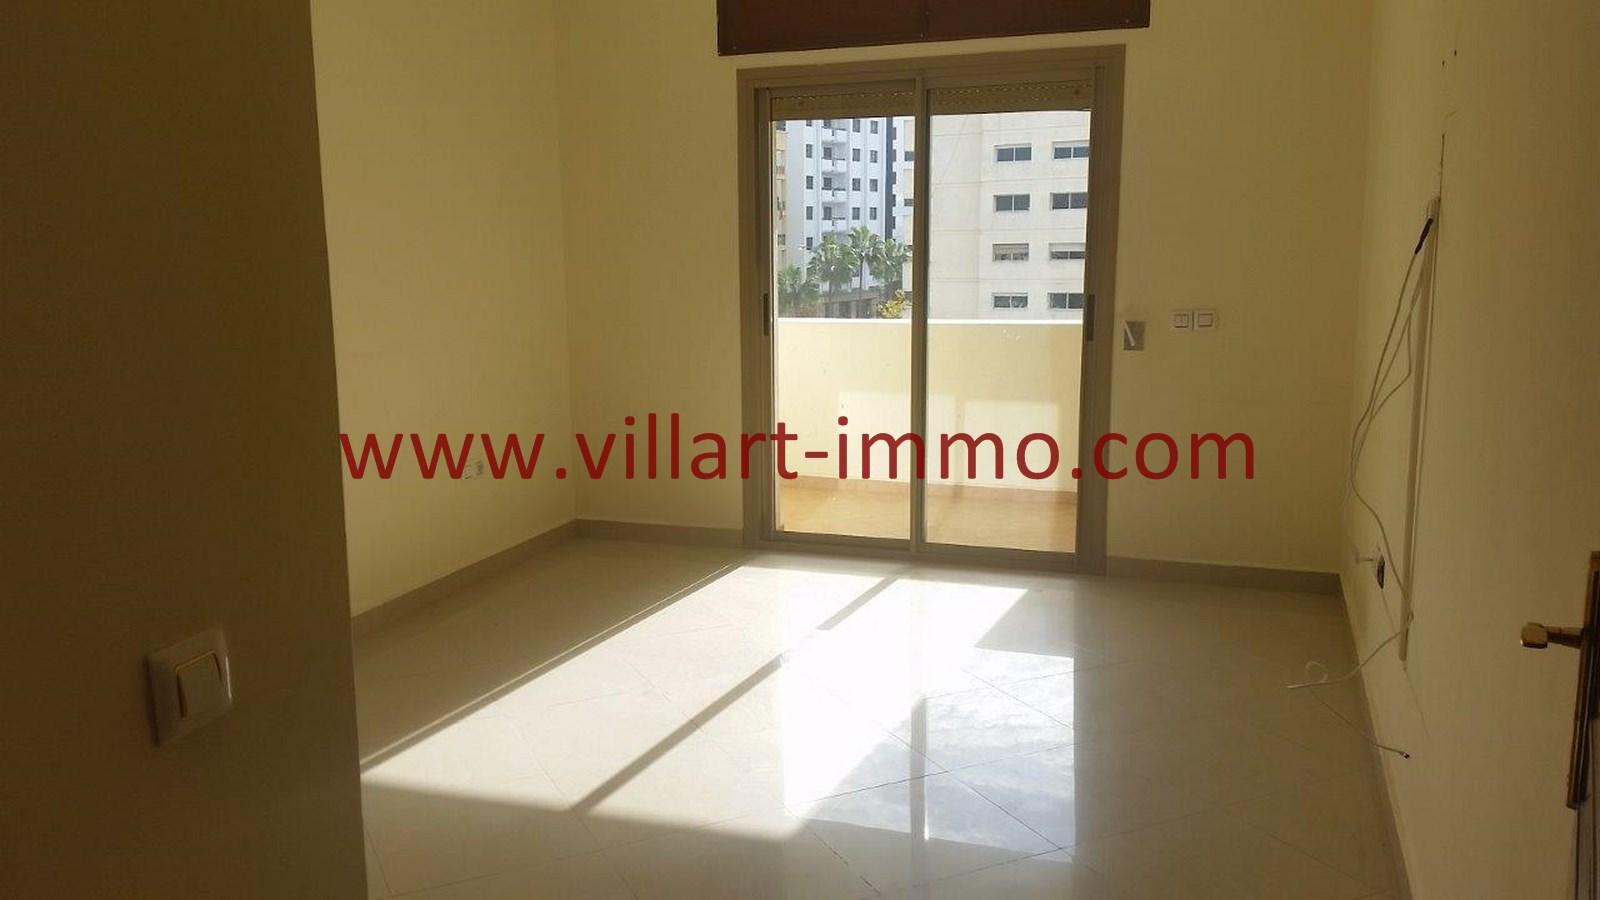 13-a-louer-appartement-tanger-iberia-chambre-l907-villart-immo